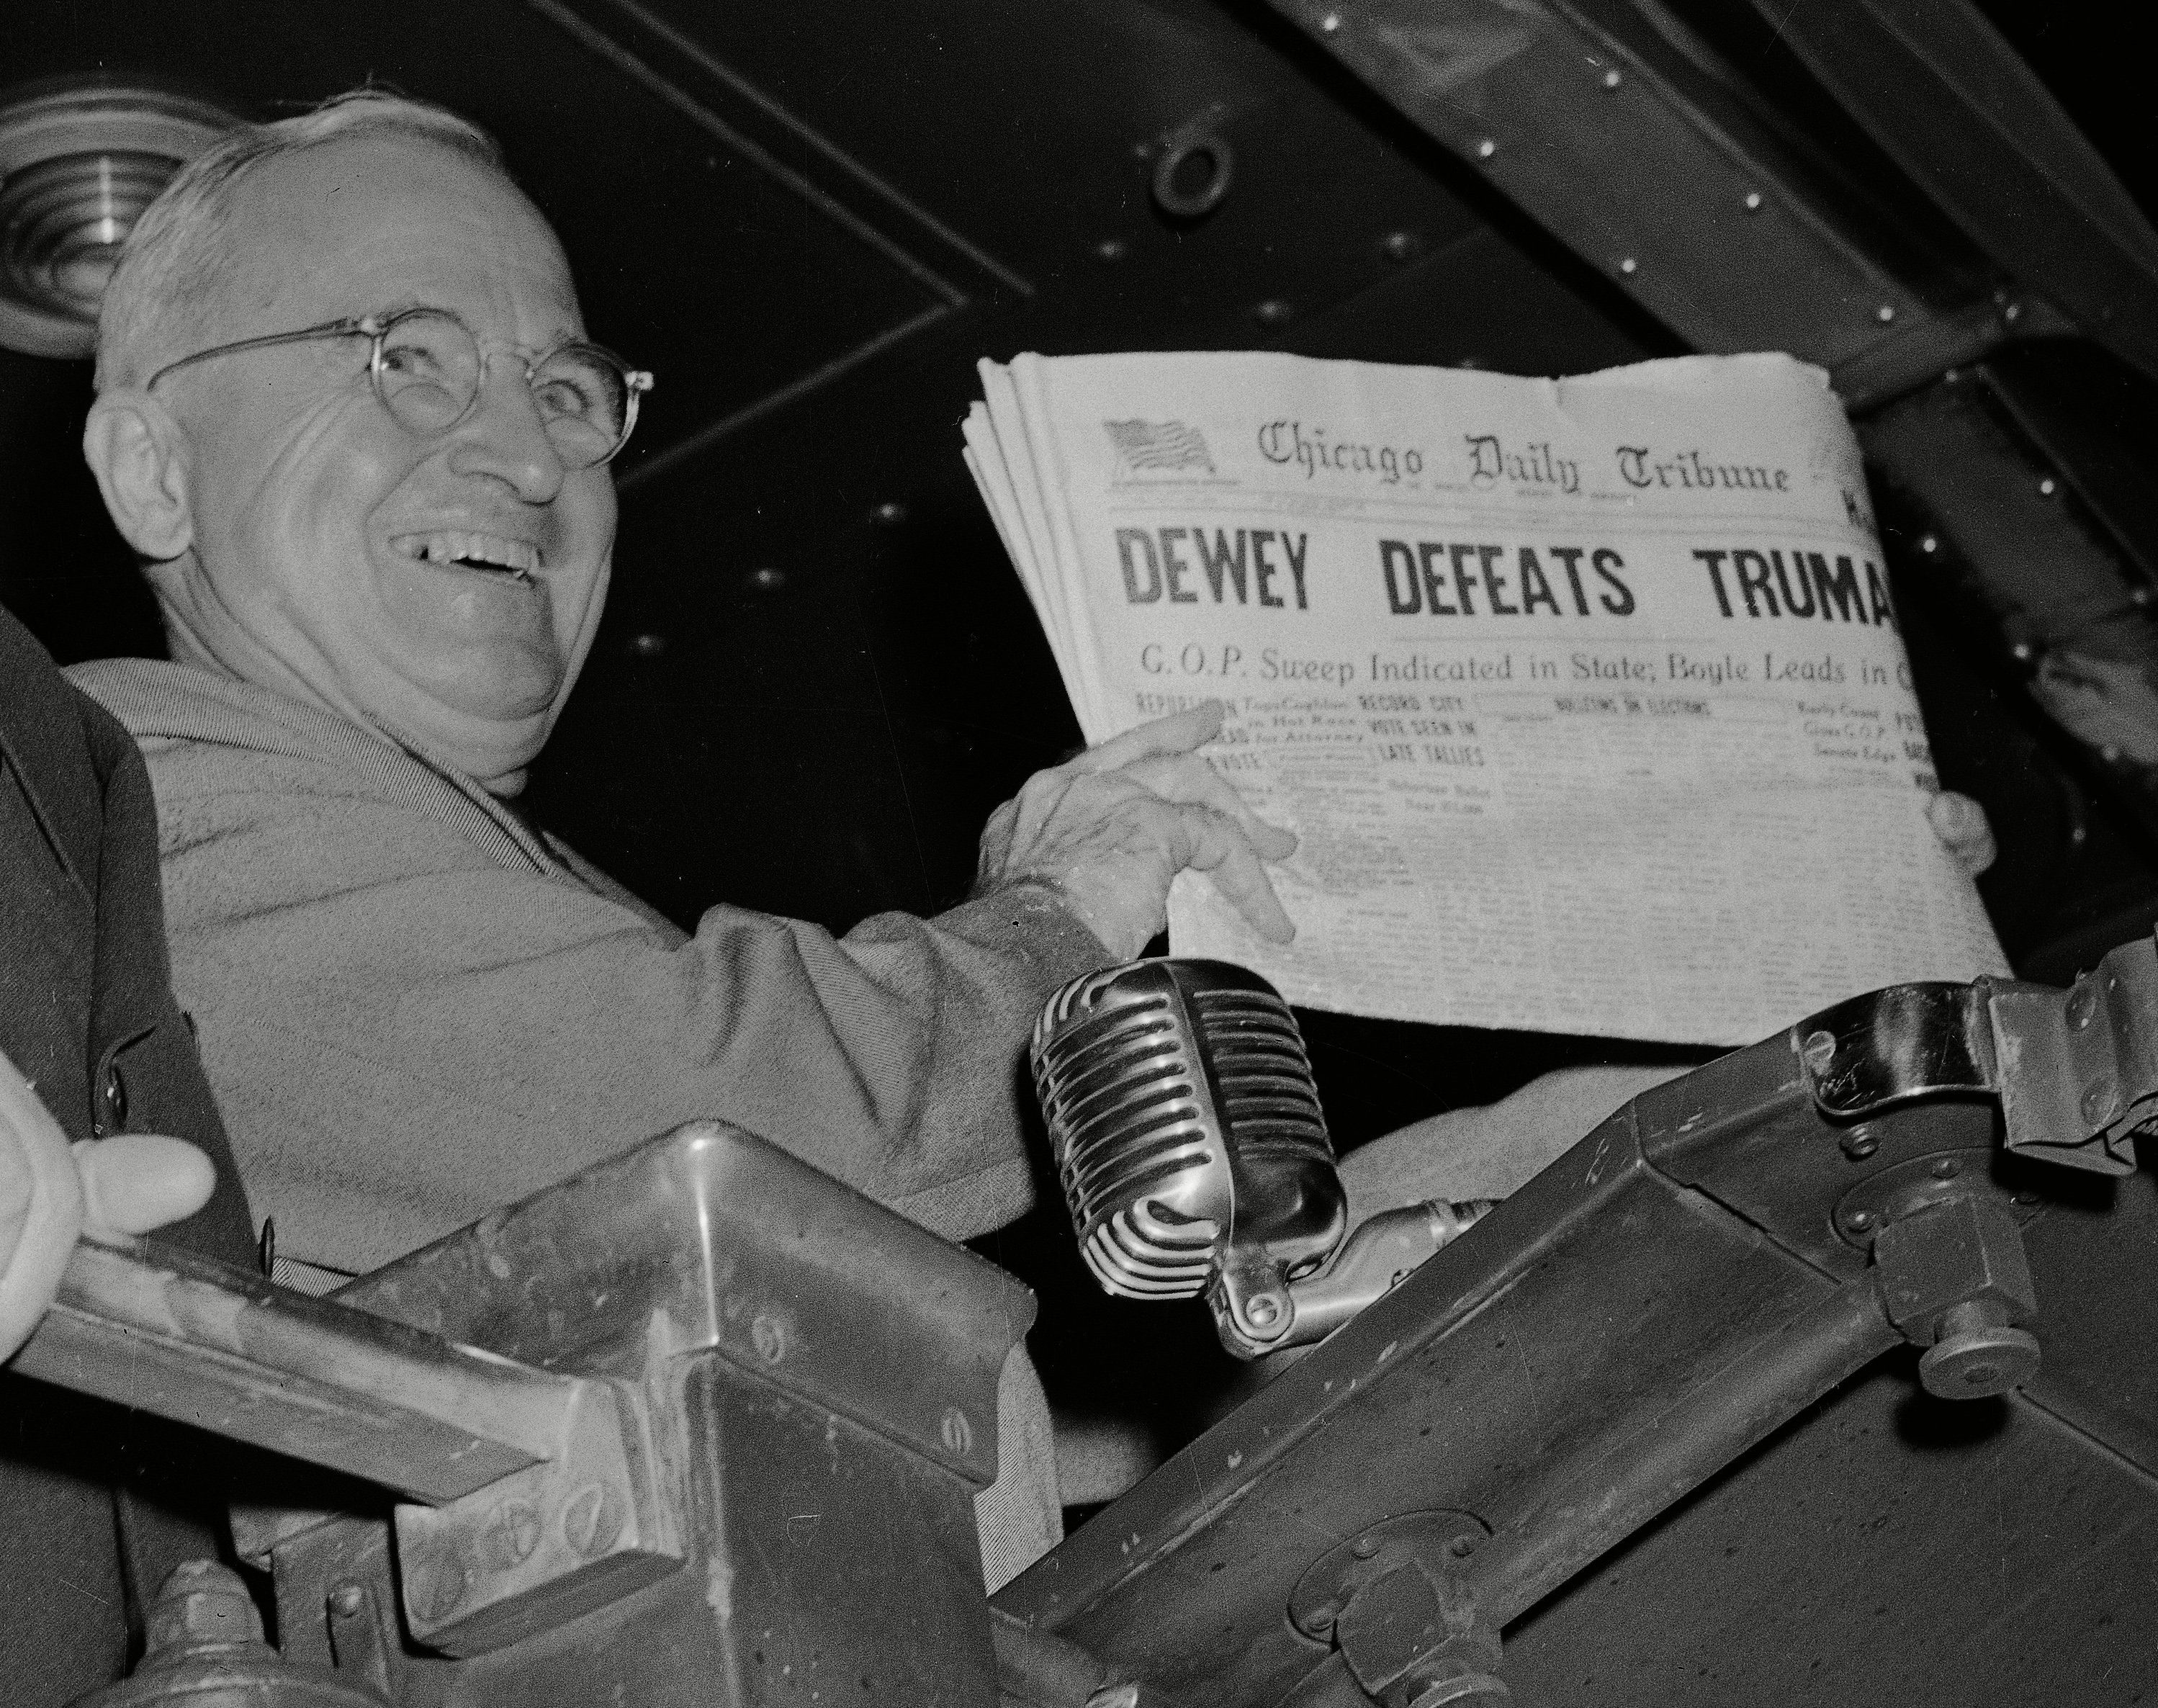 Dewey Defeats Truman, St. Louis, USA